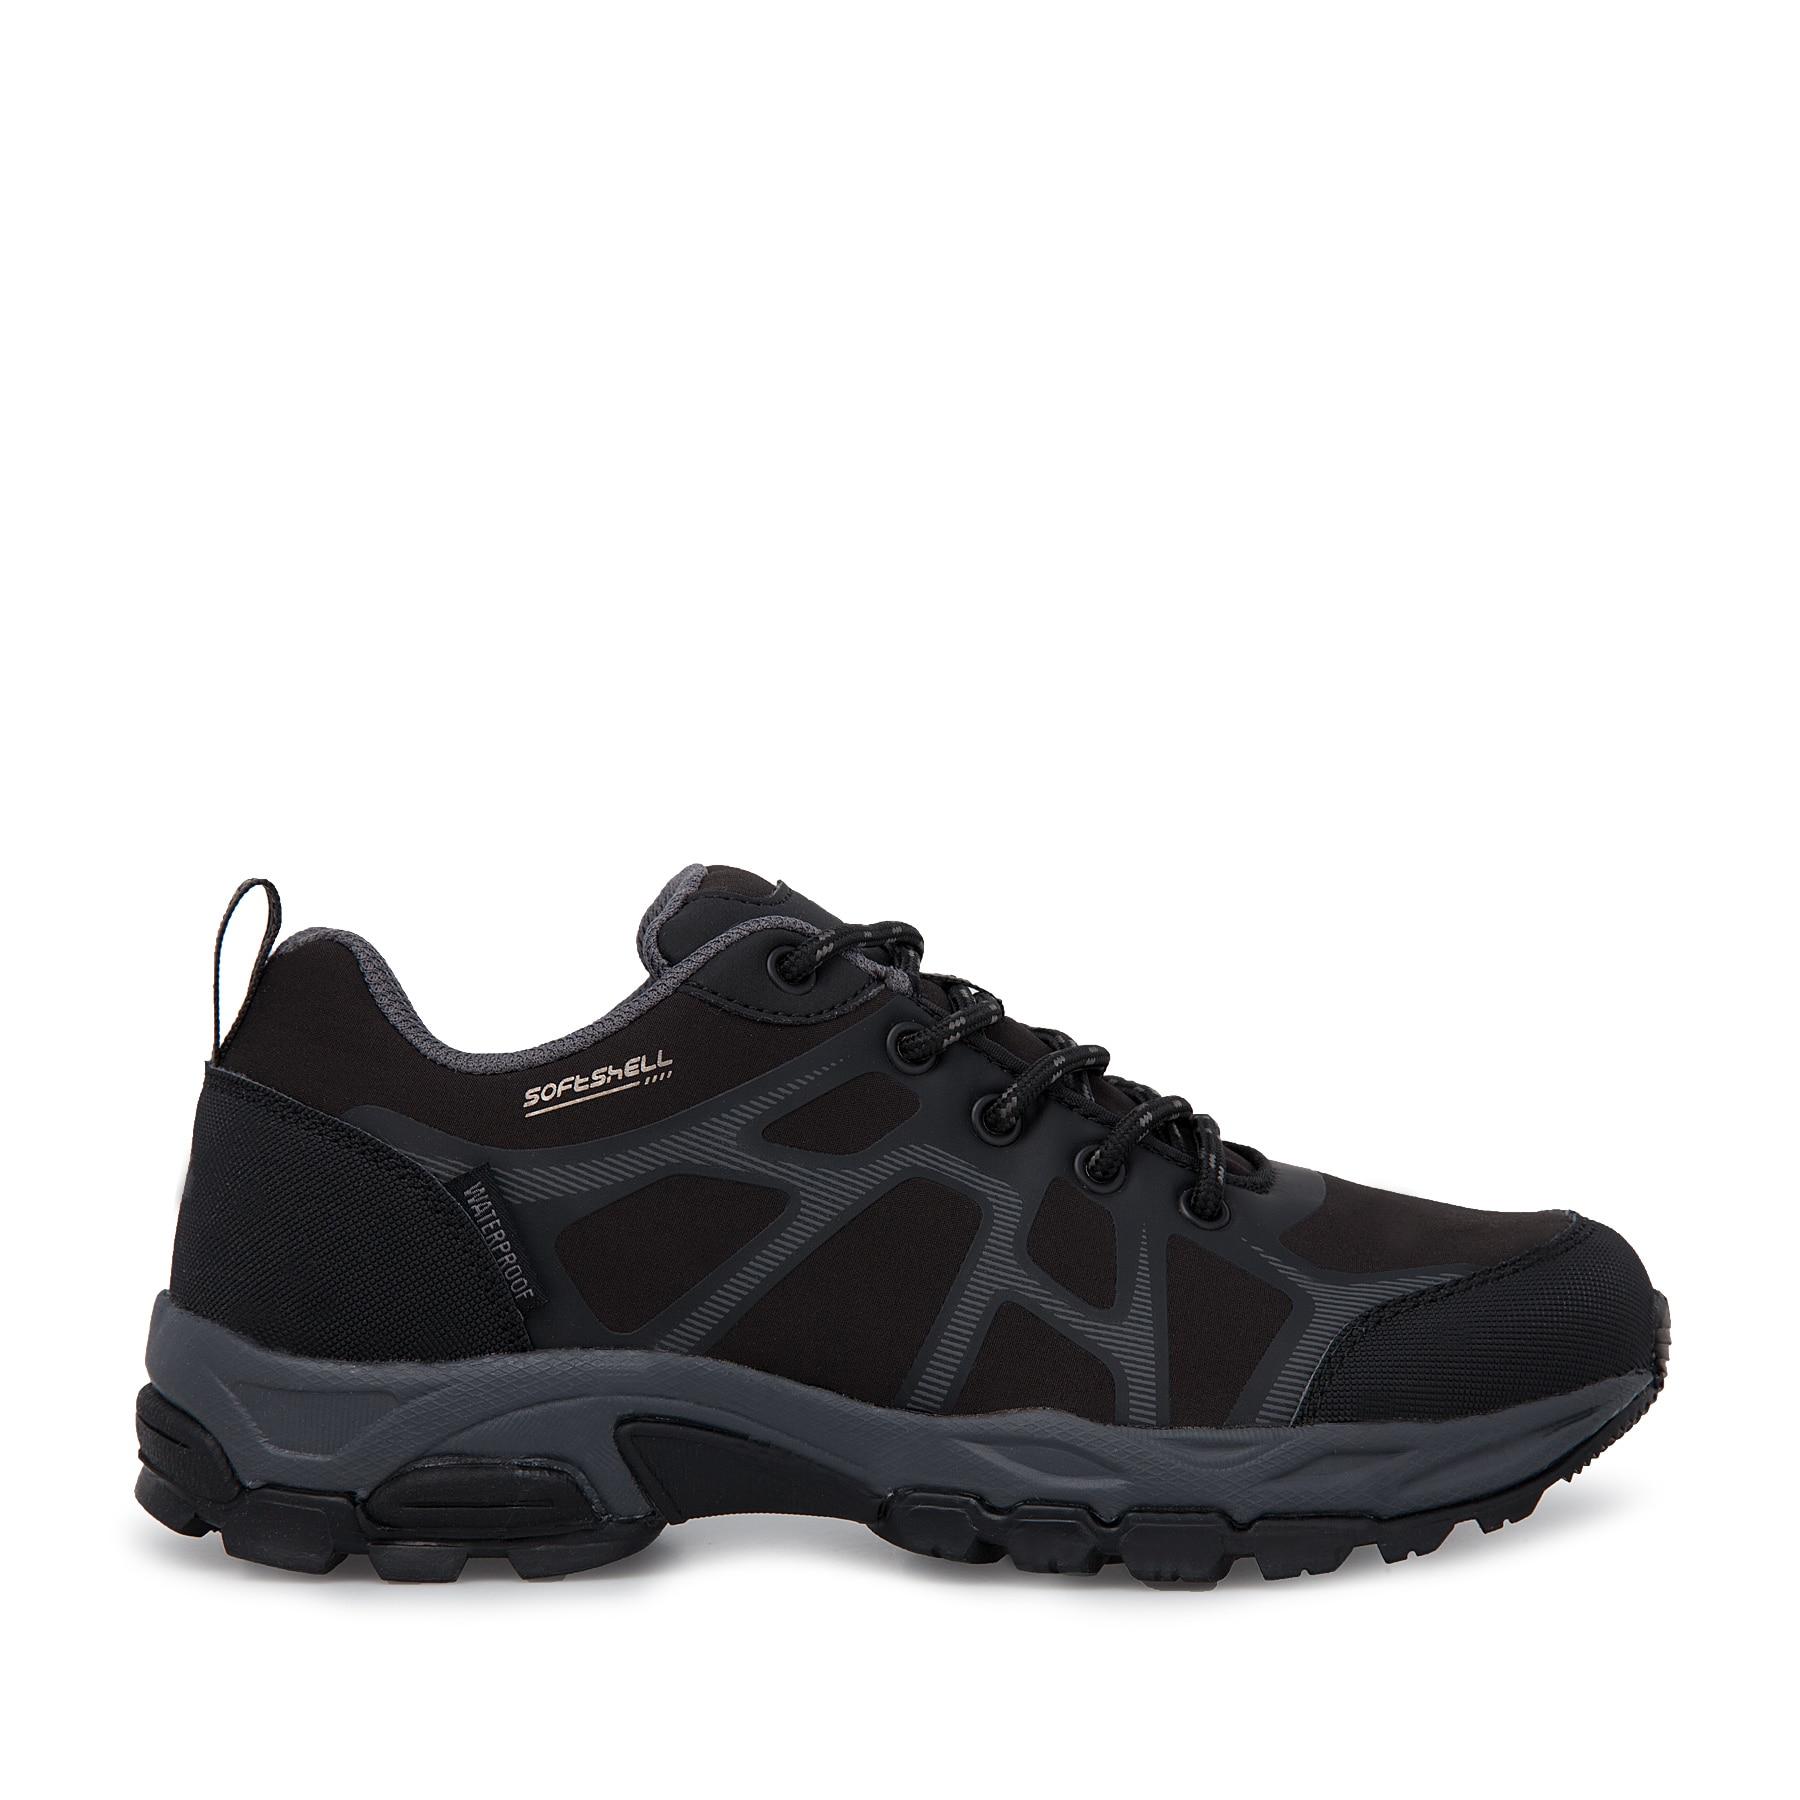 Lumberjack Soft Shell Waterproof Shoes WOMEN SHOES MATHEW WMN